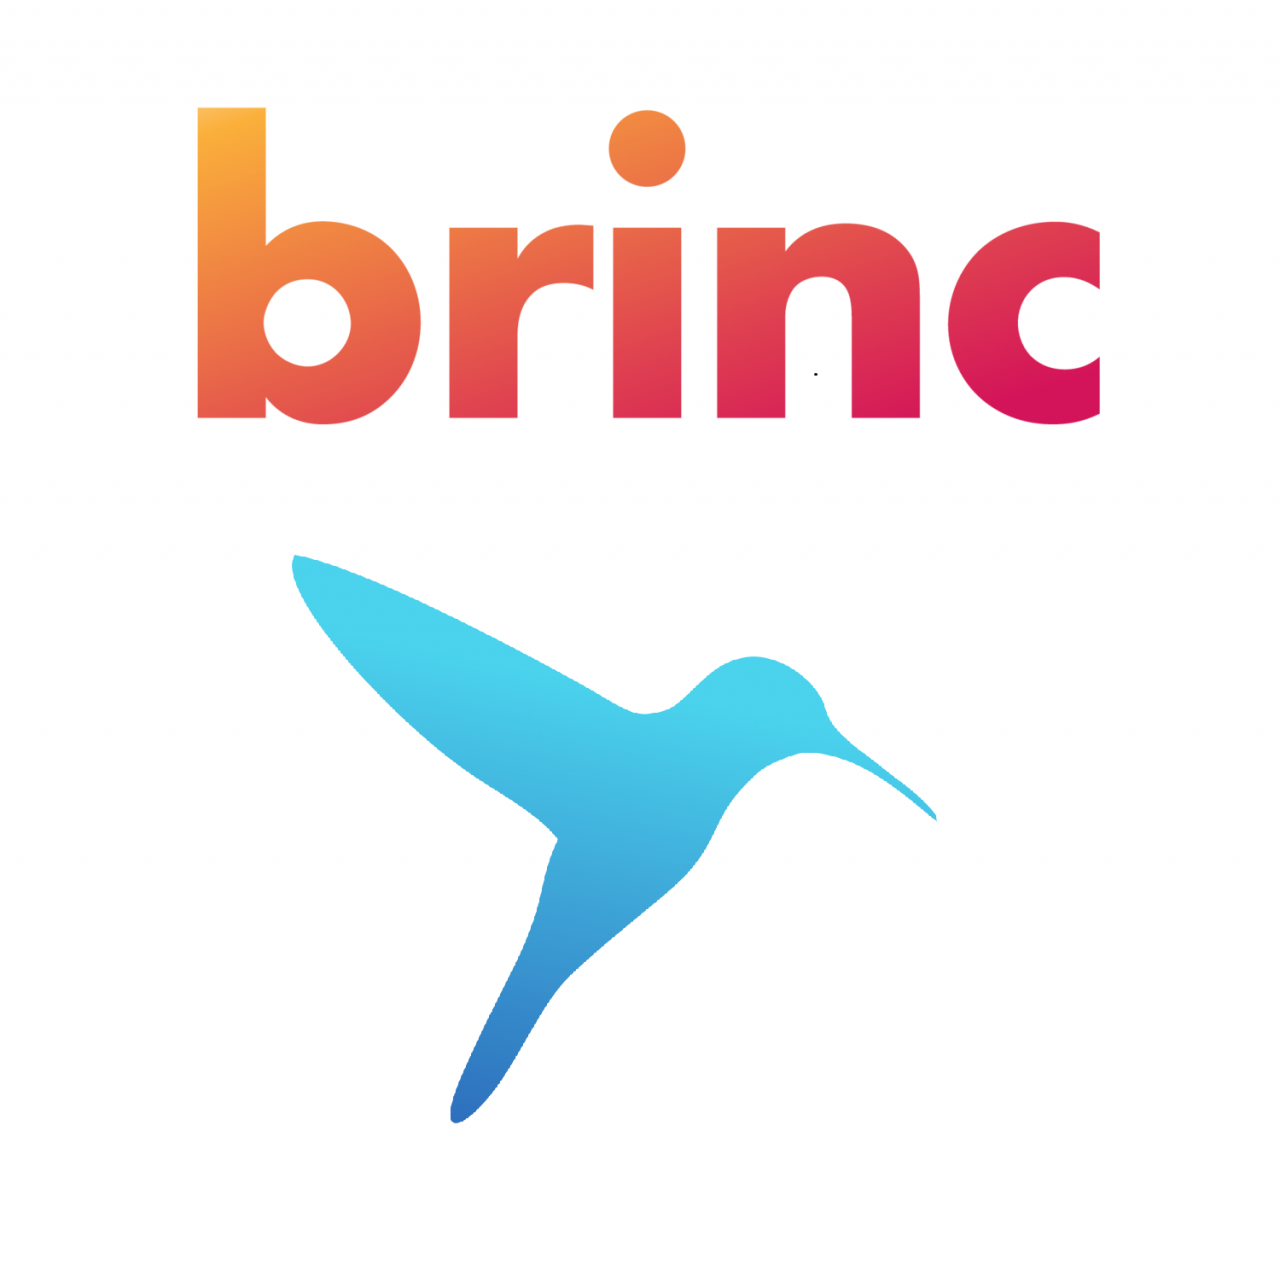 https://diaven.de/wp-content/uploads/2019/12/brinc_logo_final1-1-1280x1277.png